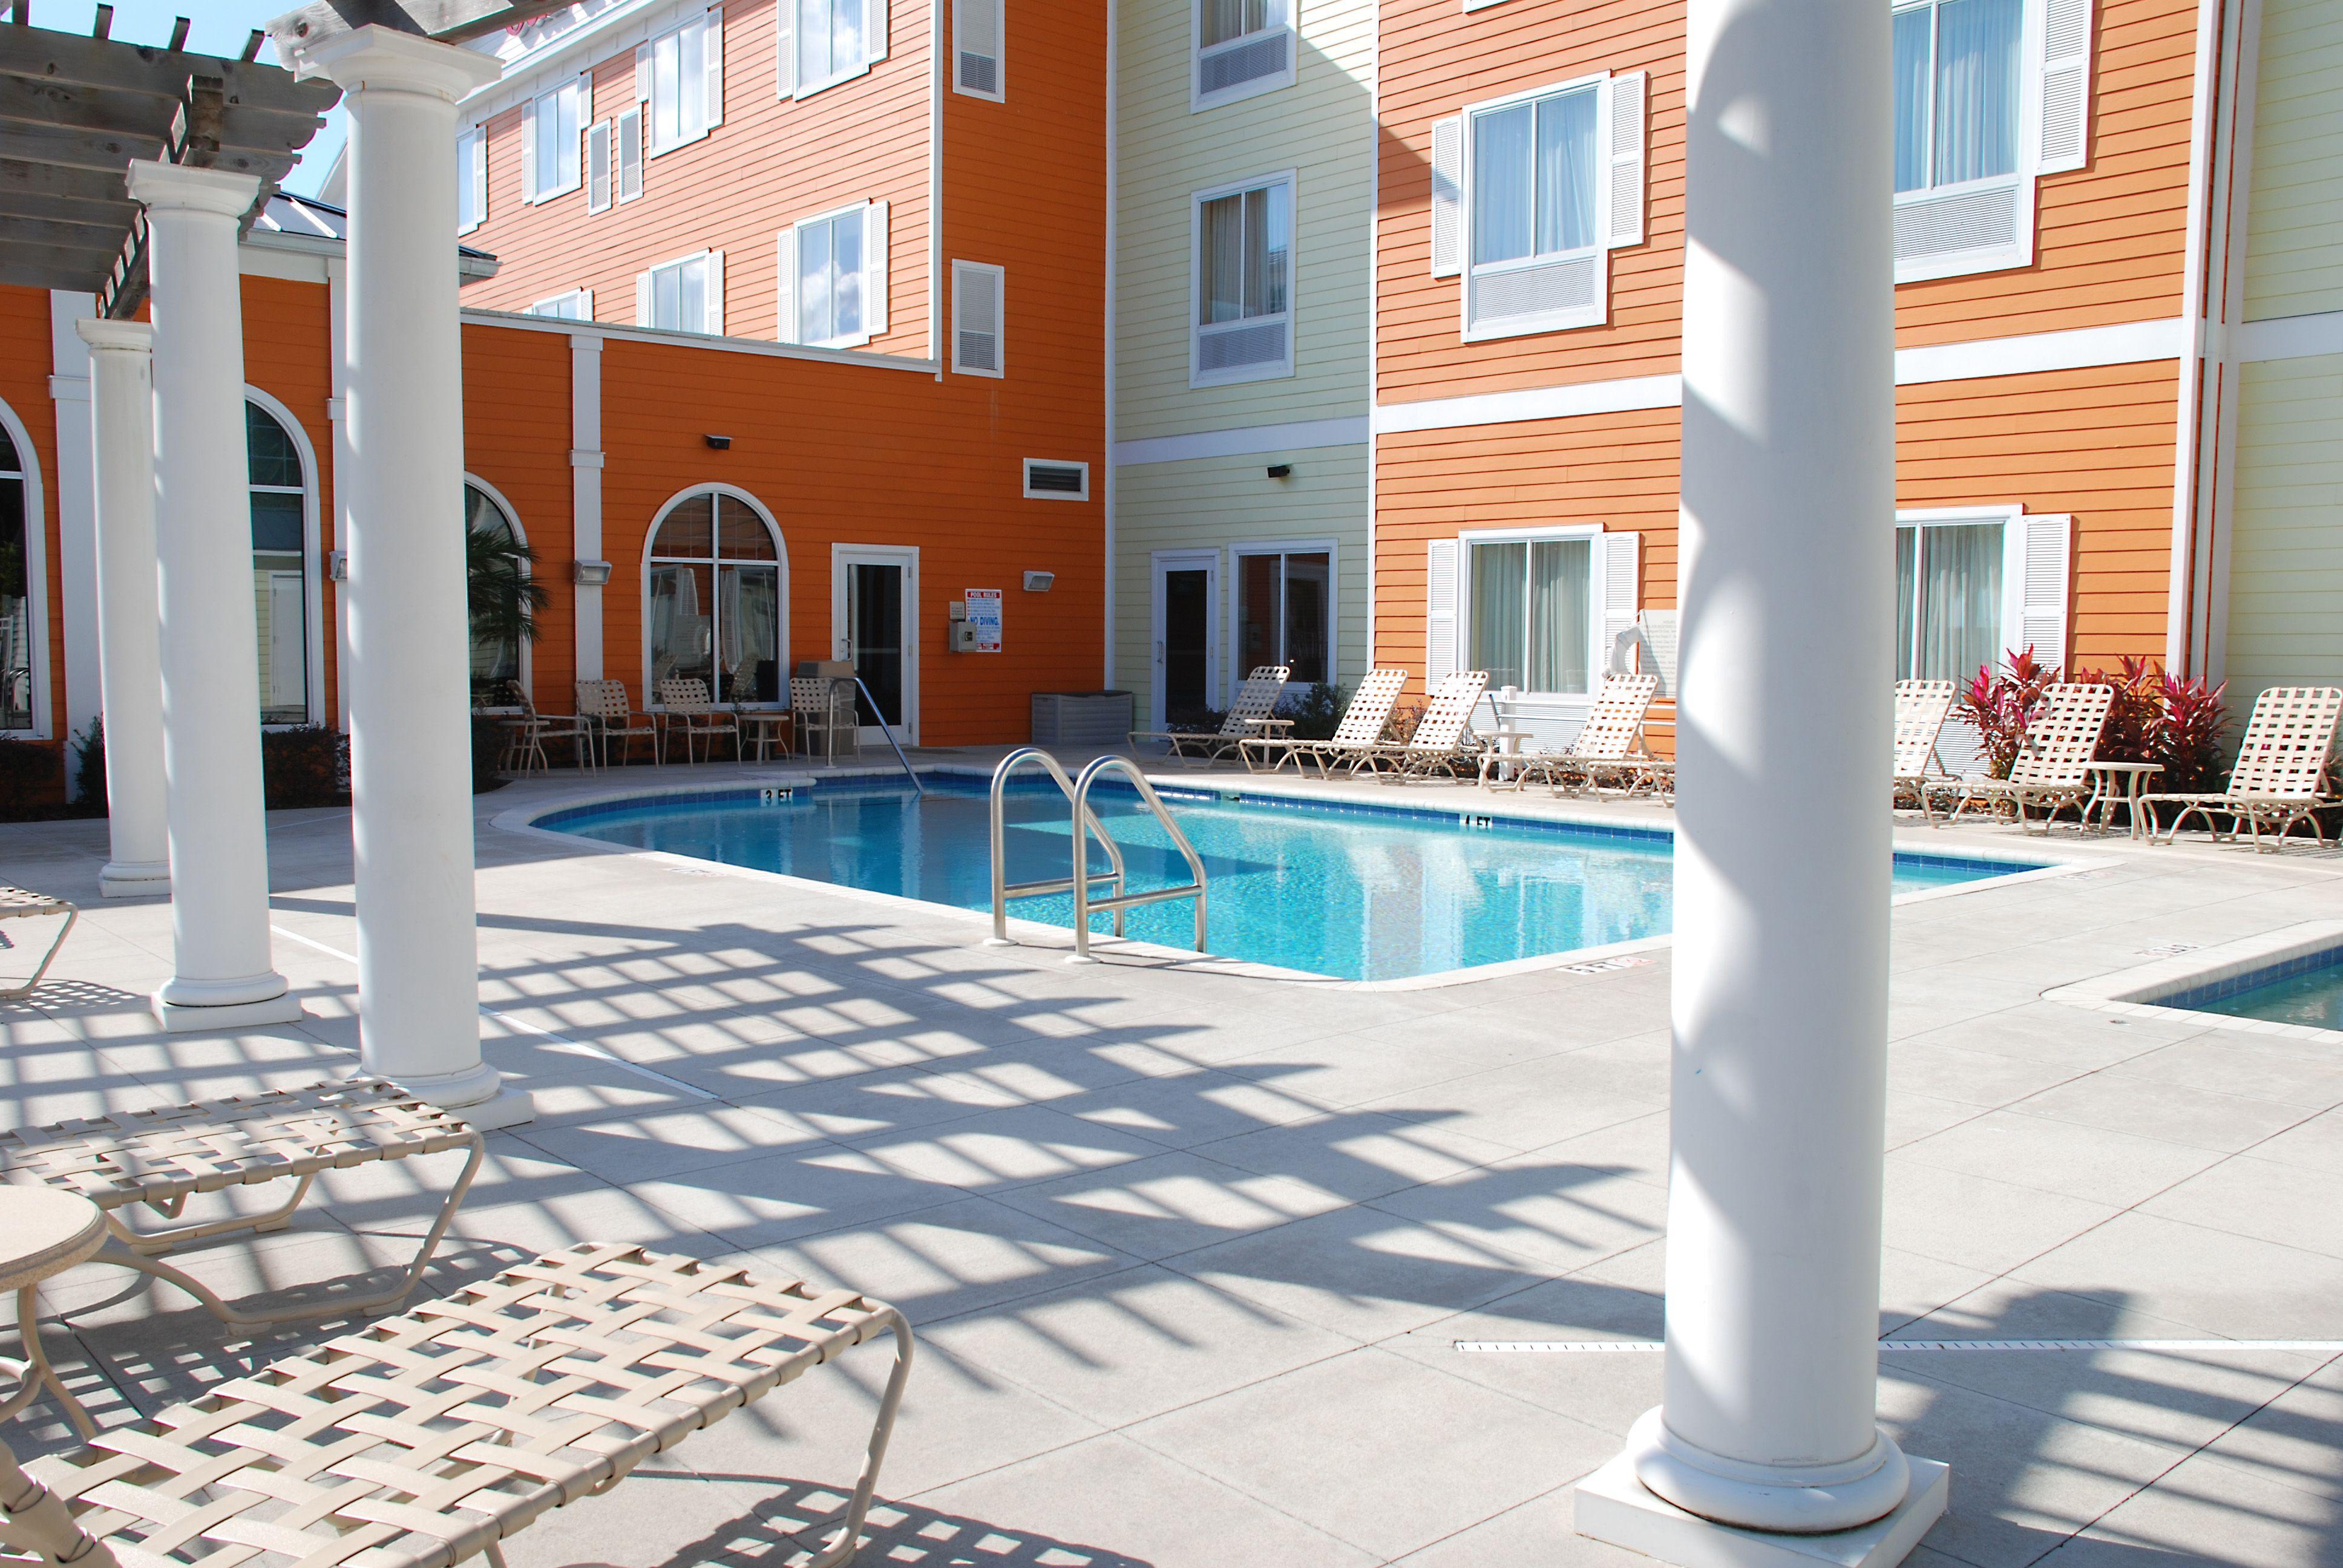 Charming Outdoor Pool At Hilton Garden Inn Lakeland Gallery